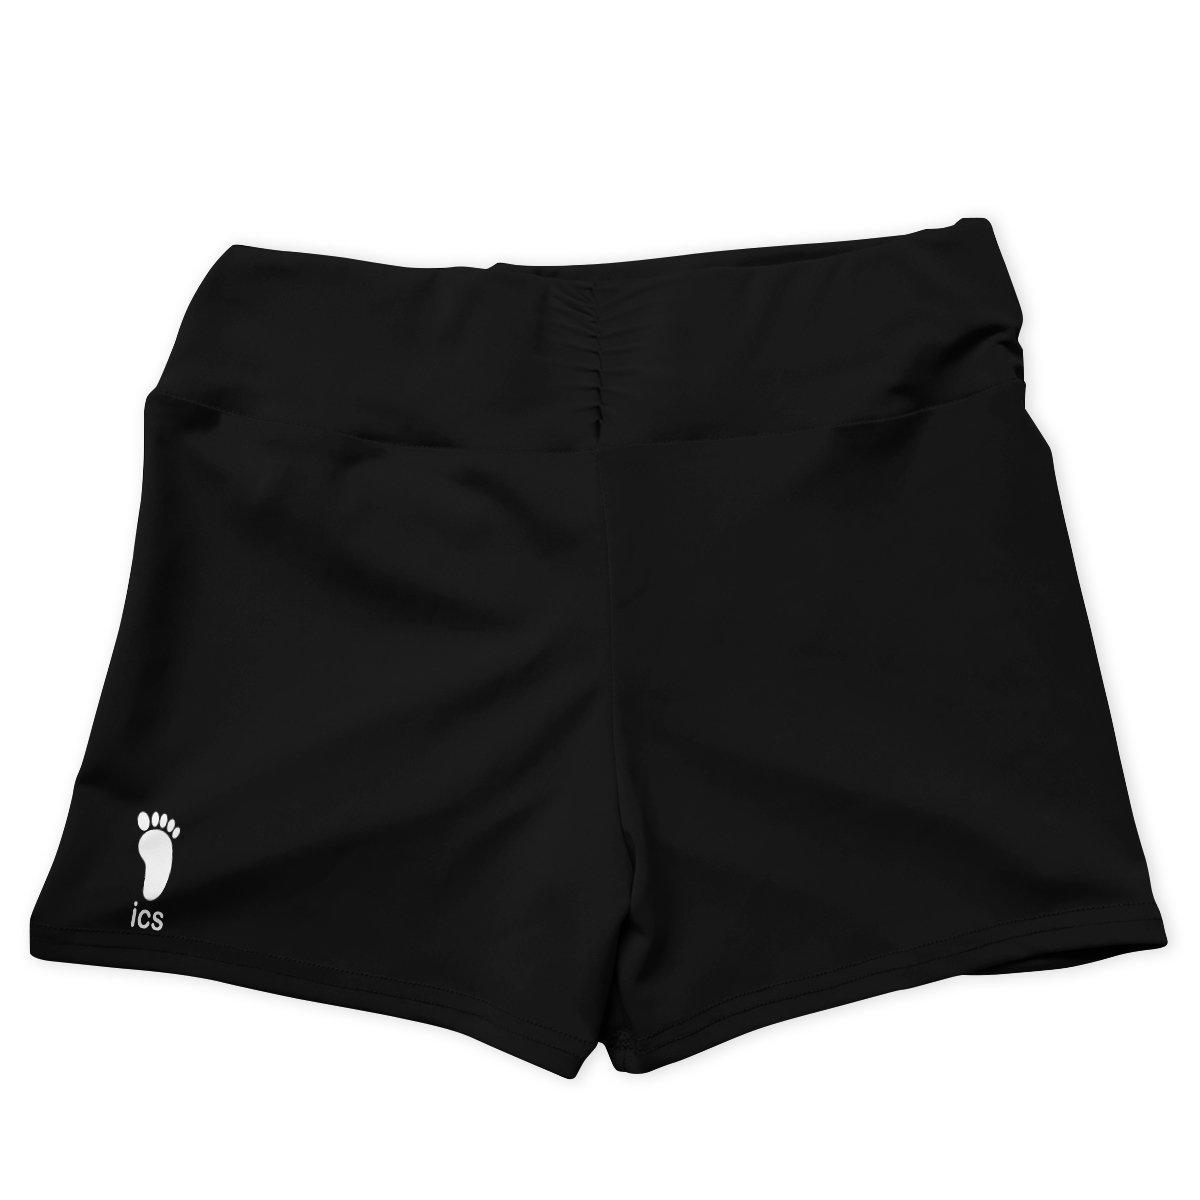 team inarizaki active wear set 661498 - Anime Swimsuits